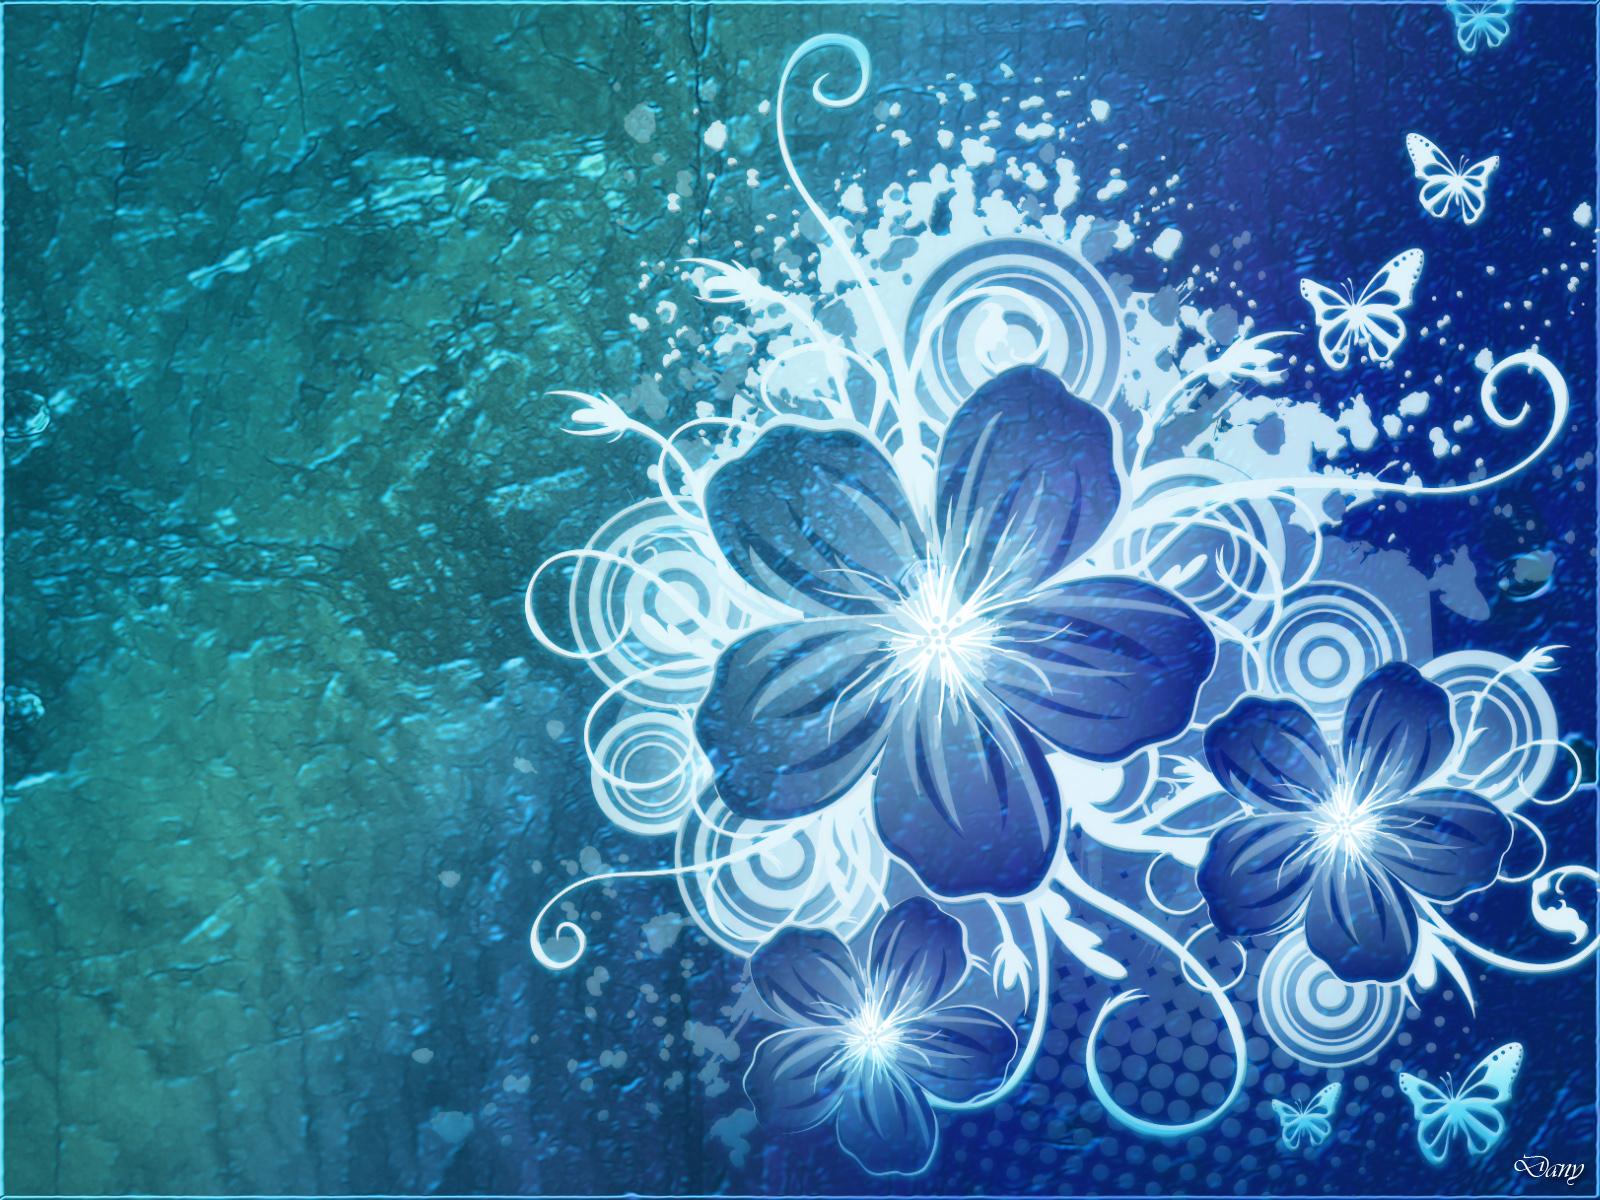 Laptop Wallpaper Hd 3d Blue Flower Wallpapers Asimbaba Free Software Free